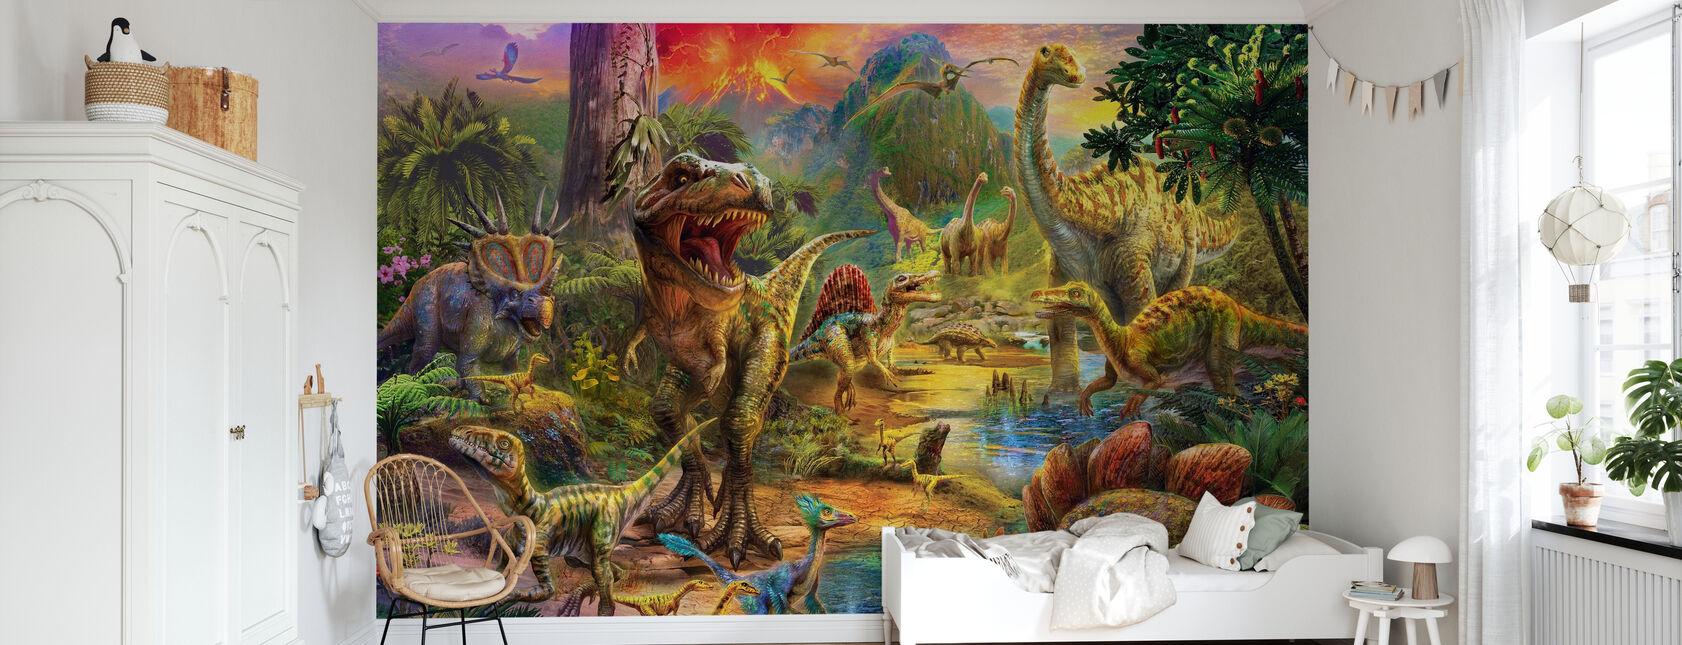 Landscape of Dinosaurs - Wallpaper - Kids Room